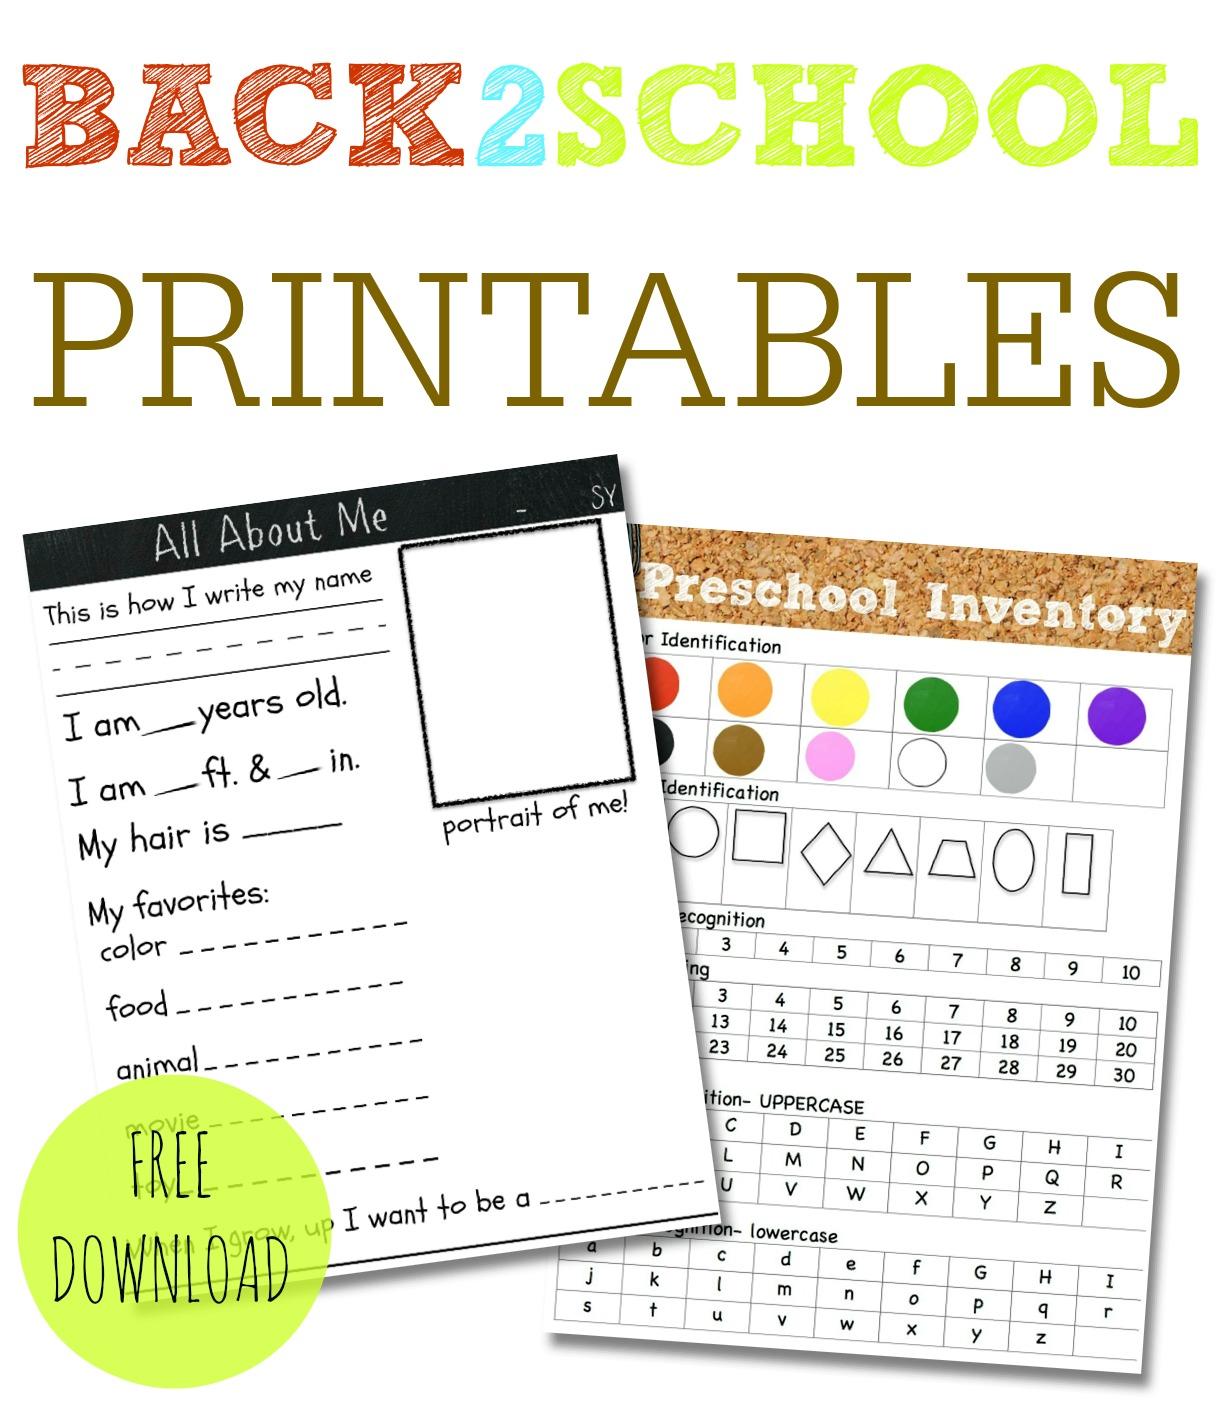 Ready For Preschool With Disney Junior Printable